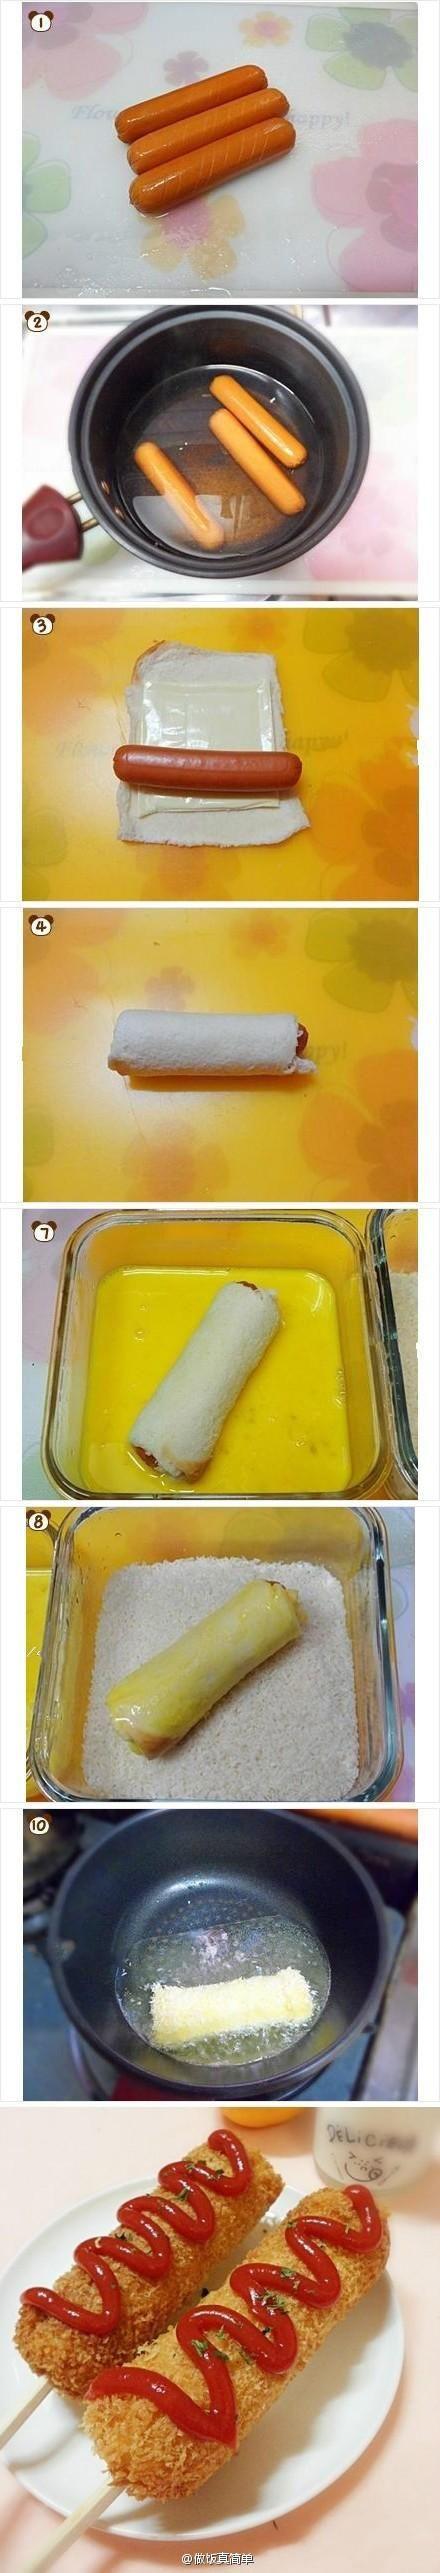 salchichas en pan bimbo y empanadas